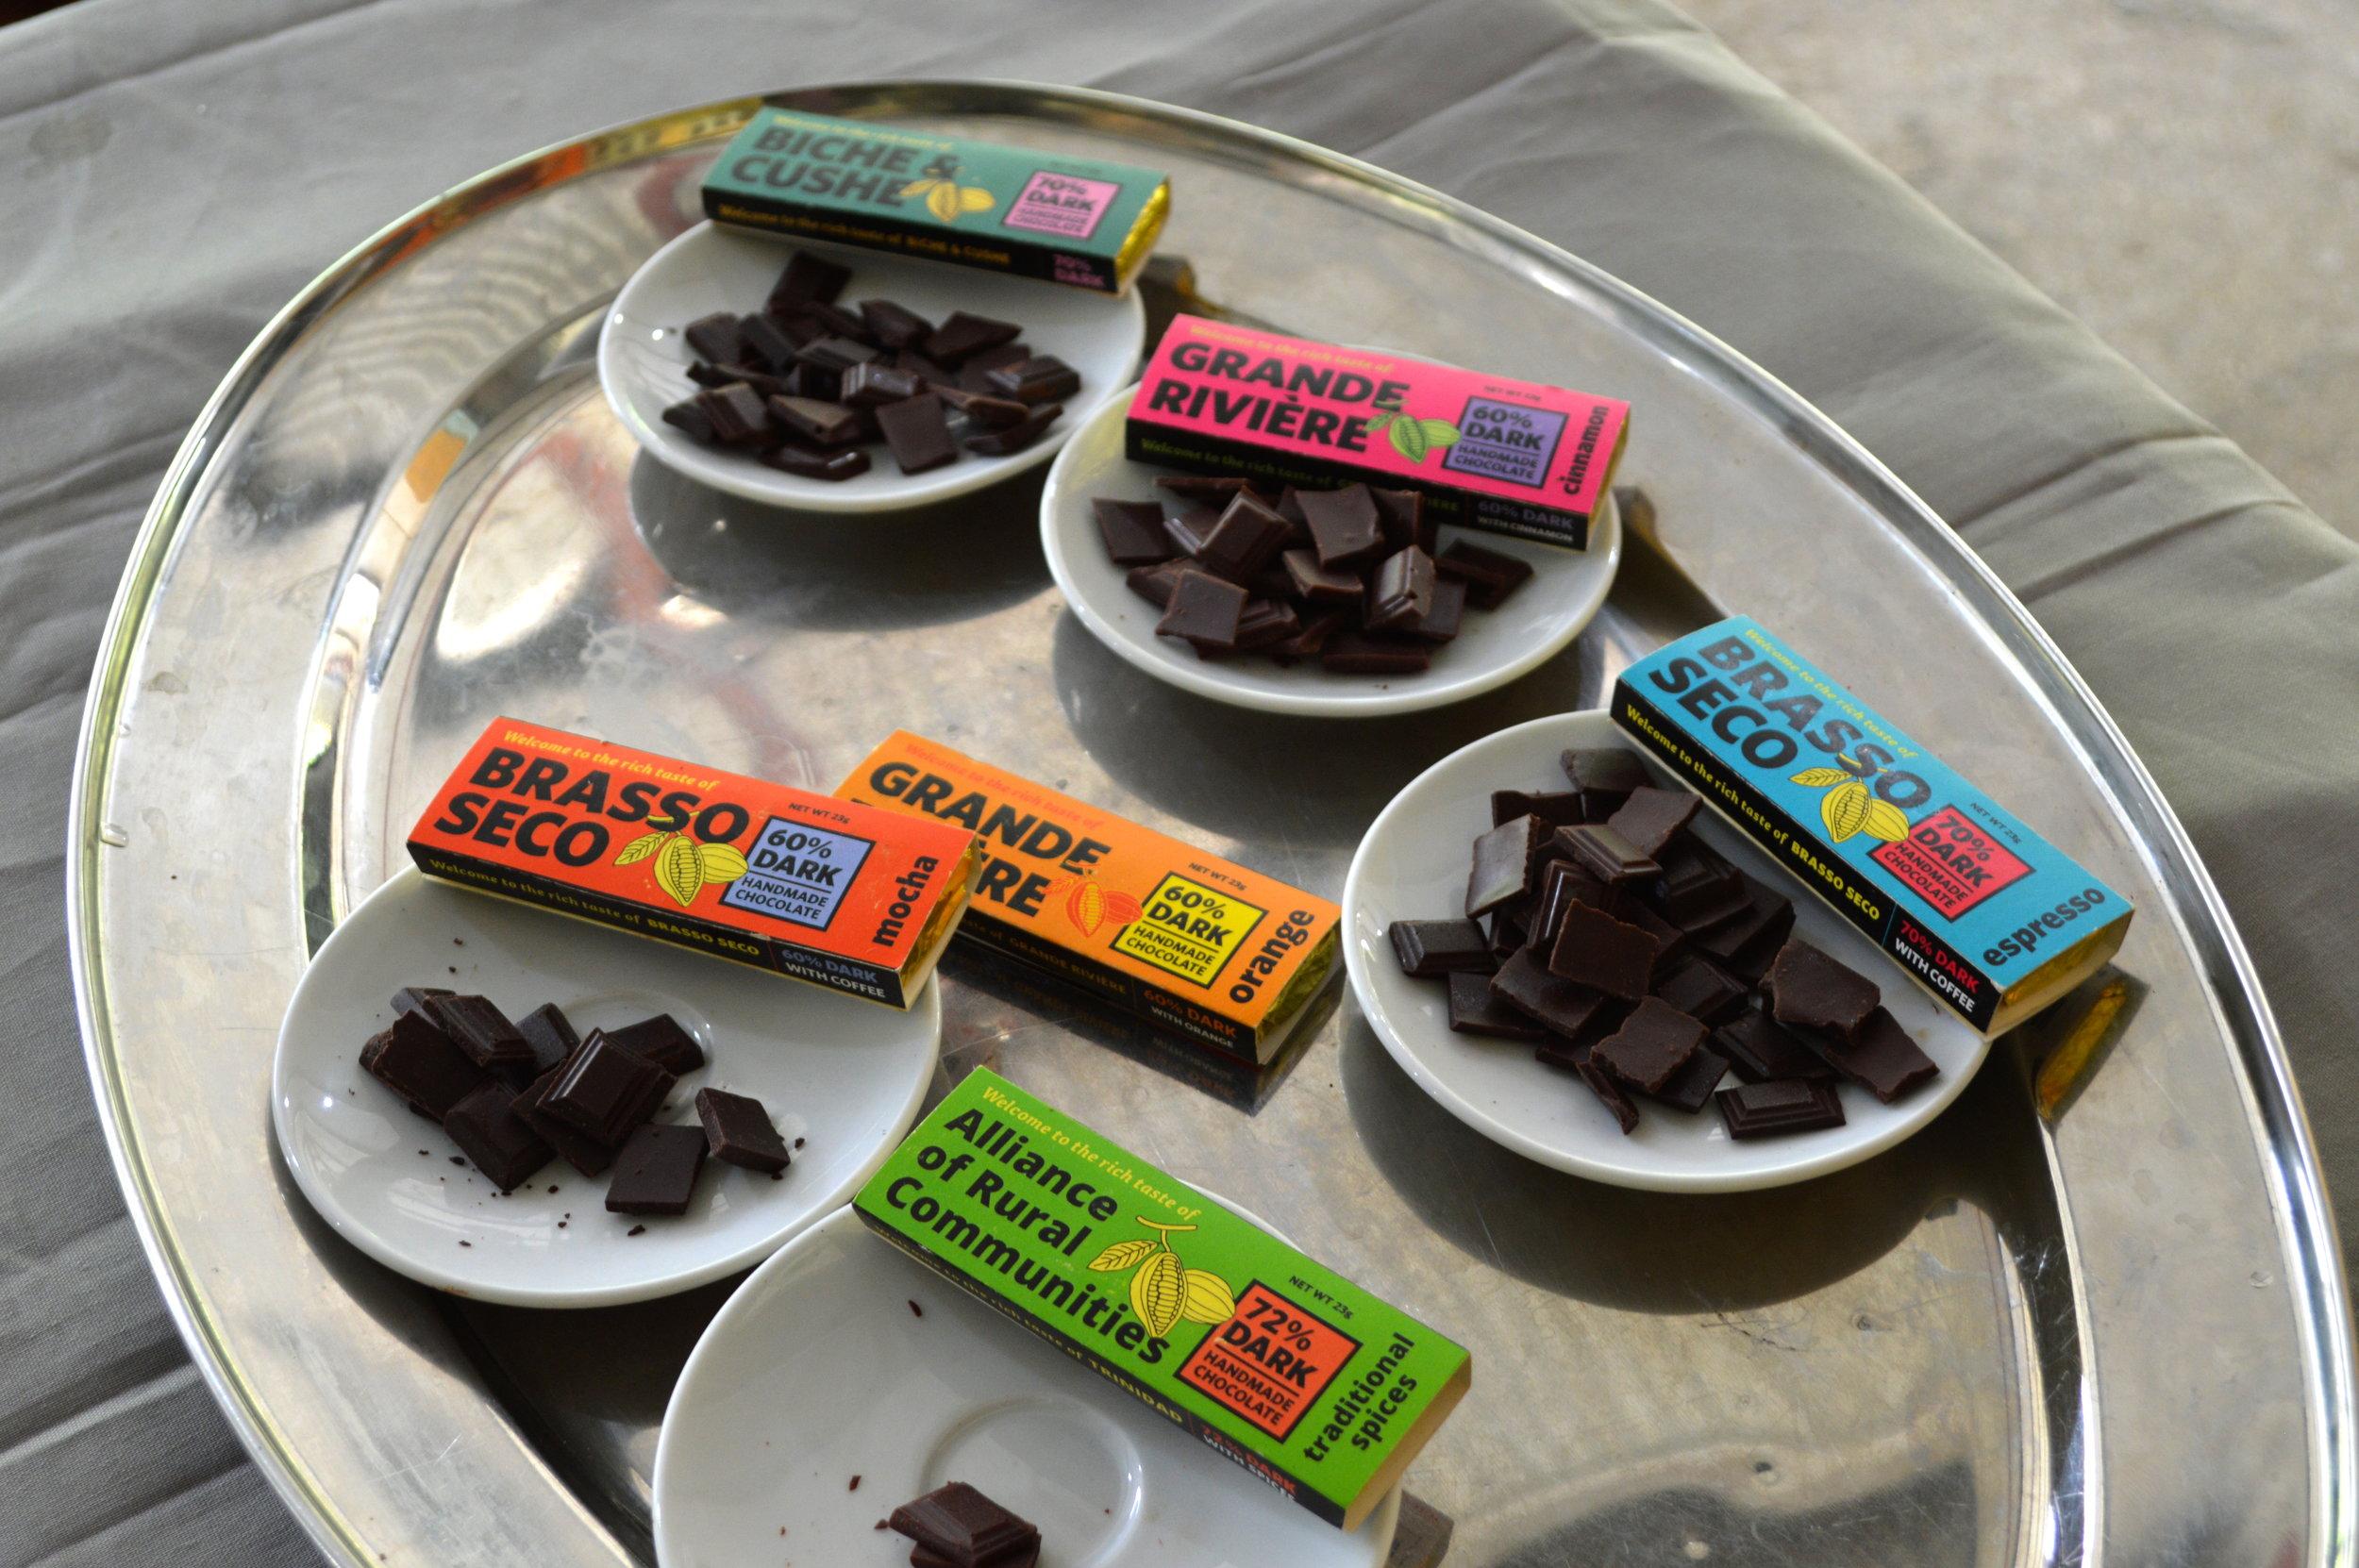 Chocolate Bars produced under ARC